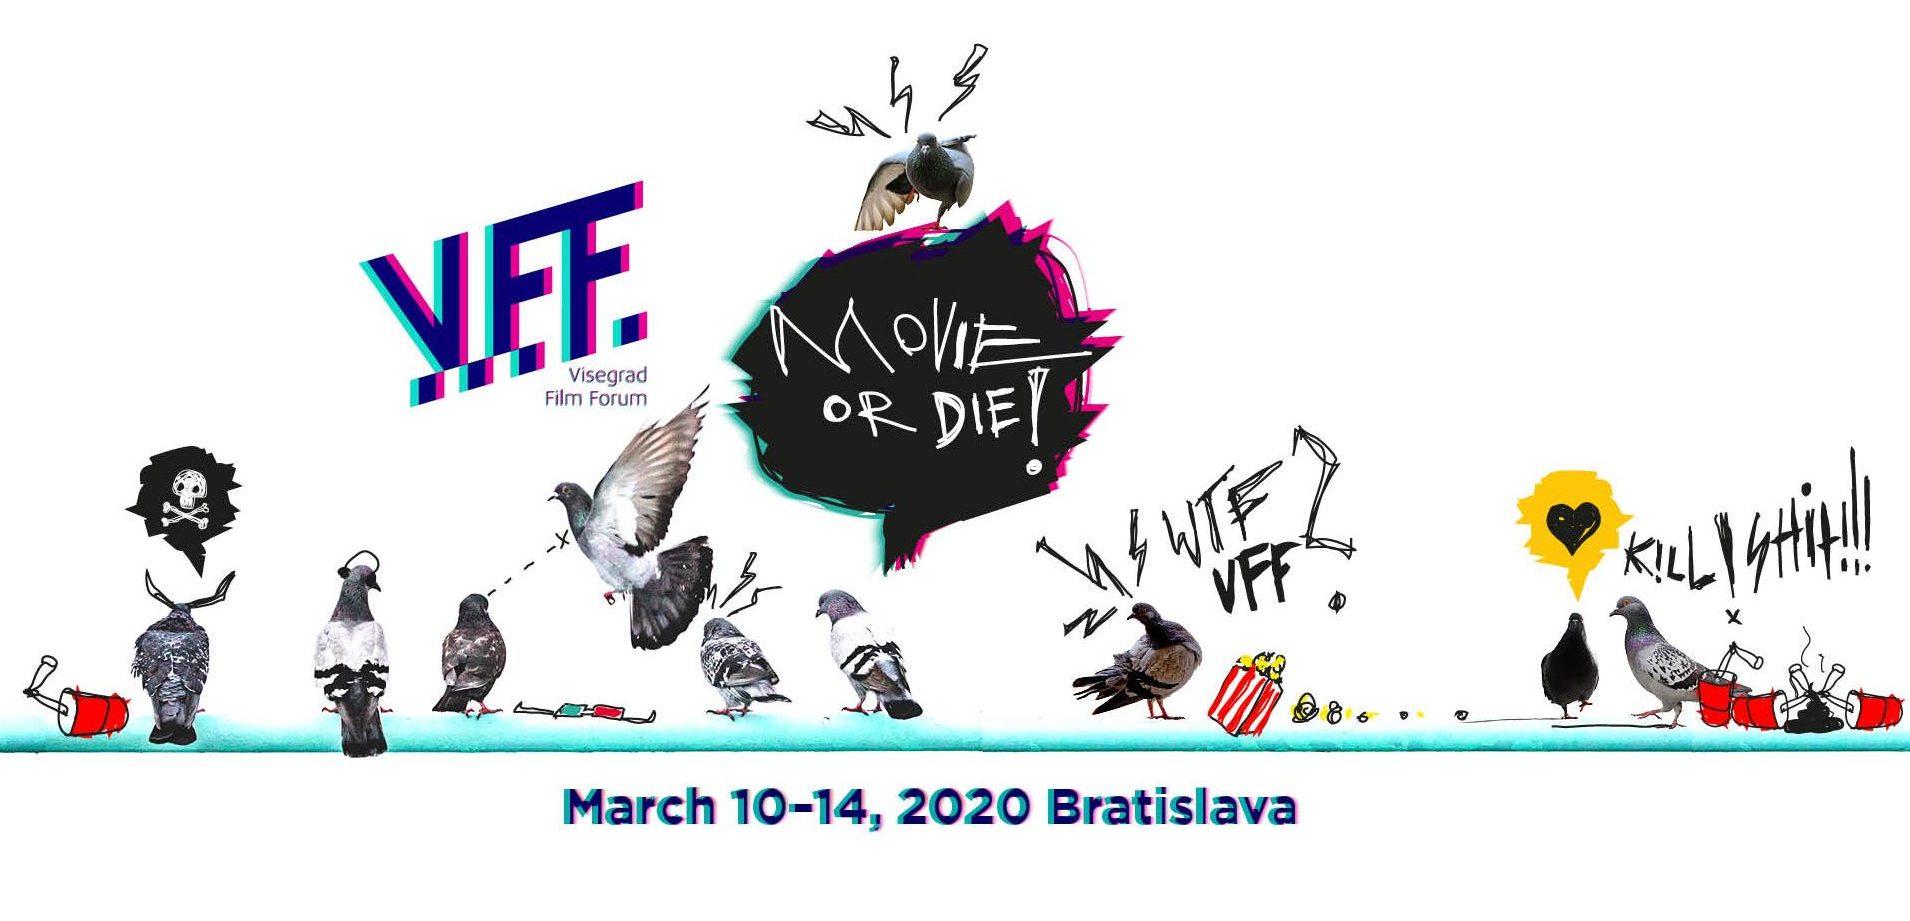 9th Visegrad Film Forum (VFF) – from March 10-14, 2020, Bratislava, Slovakia